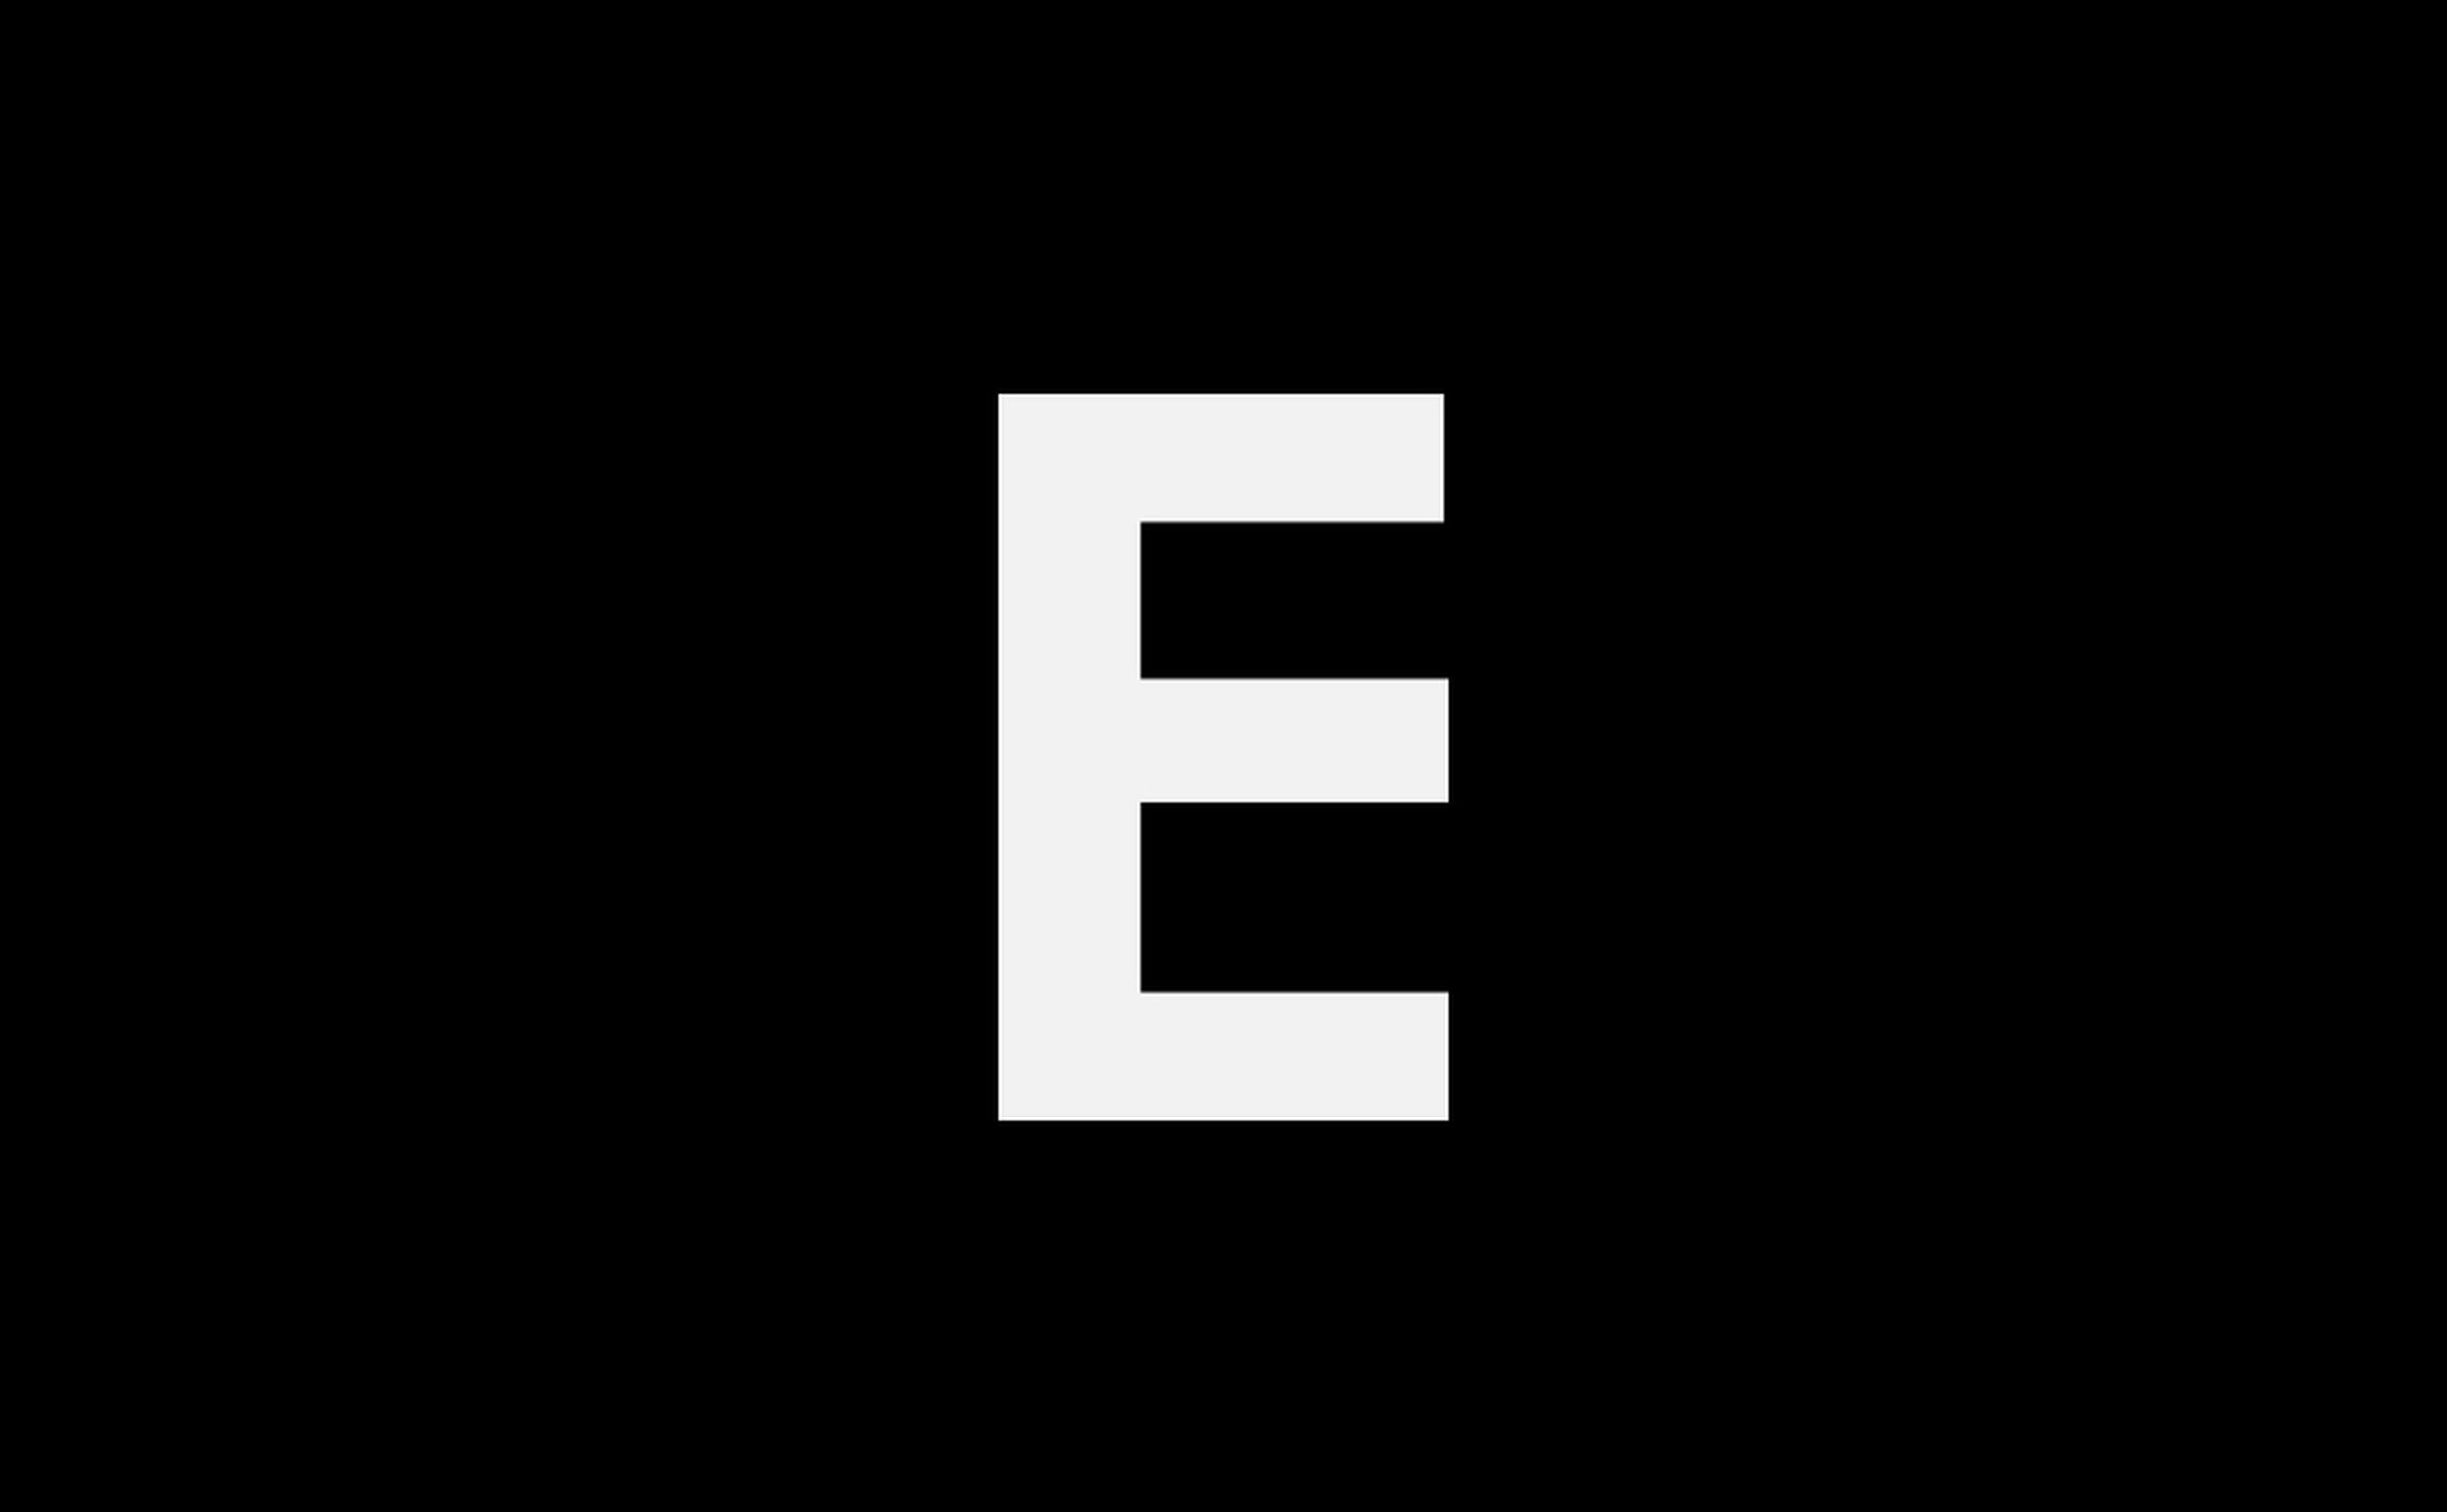 GRAFFITI ON WALL AGAINST SKY WITH BRIDGE